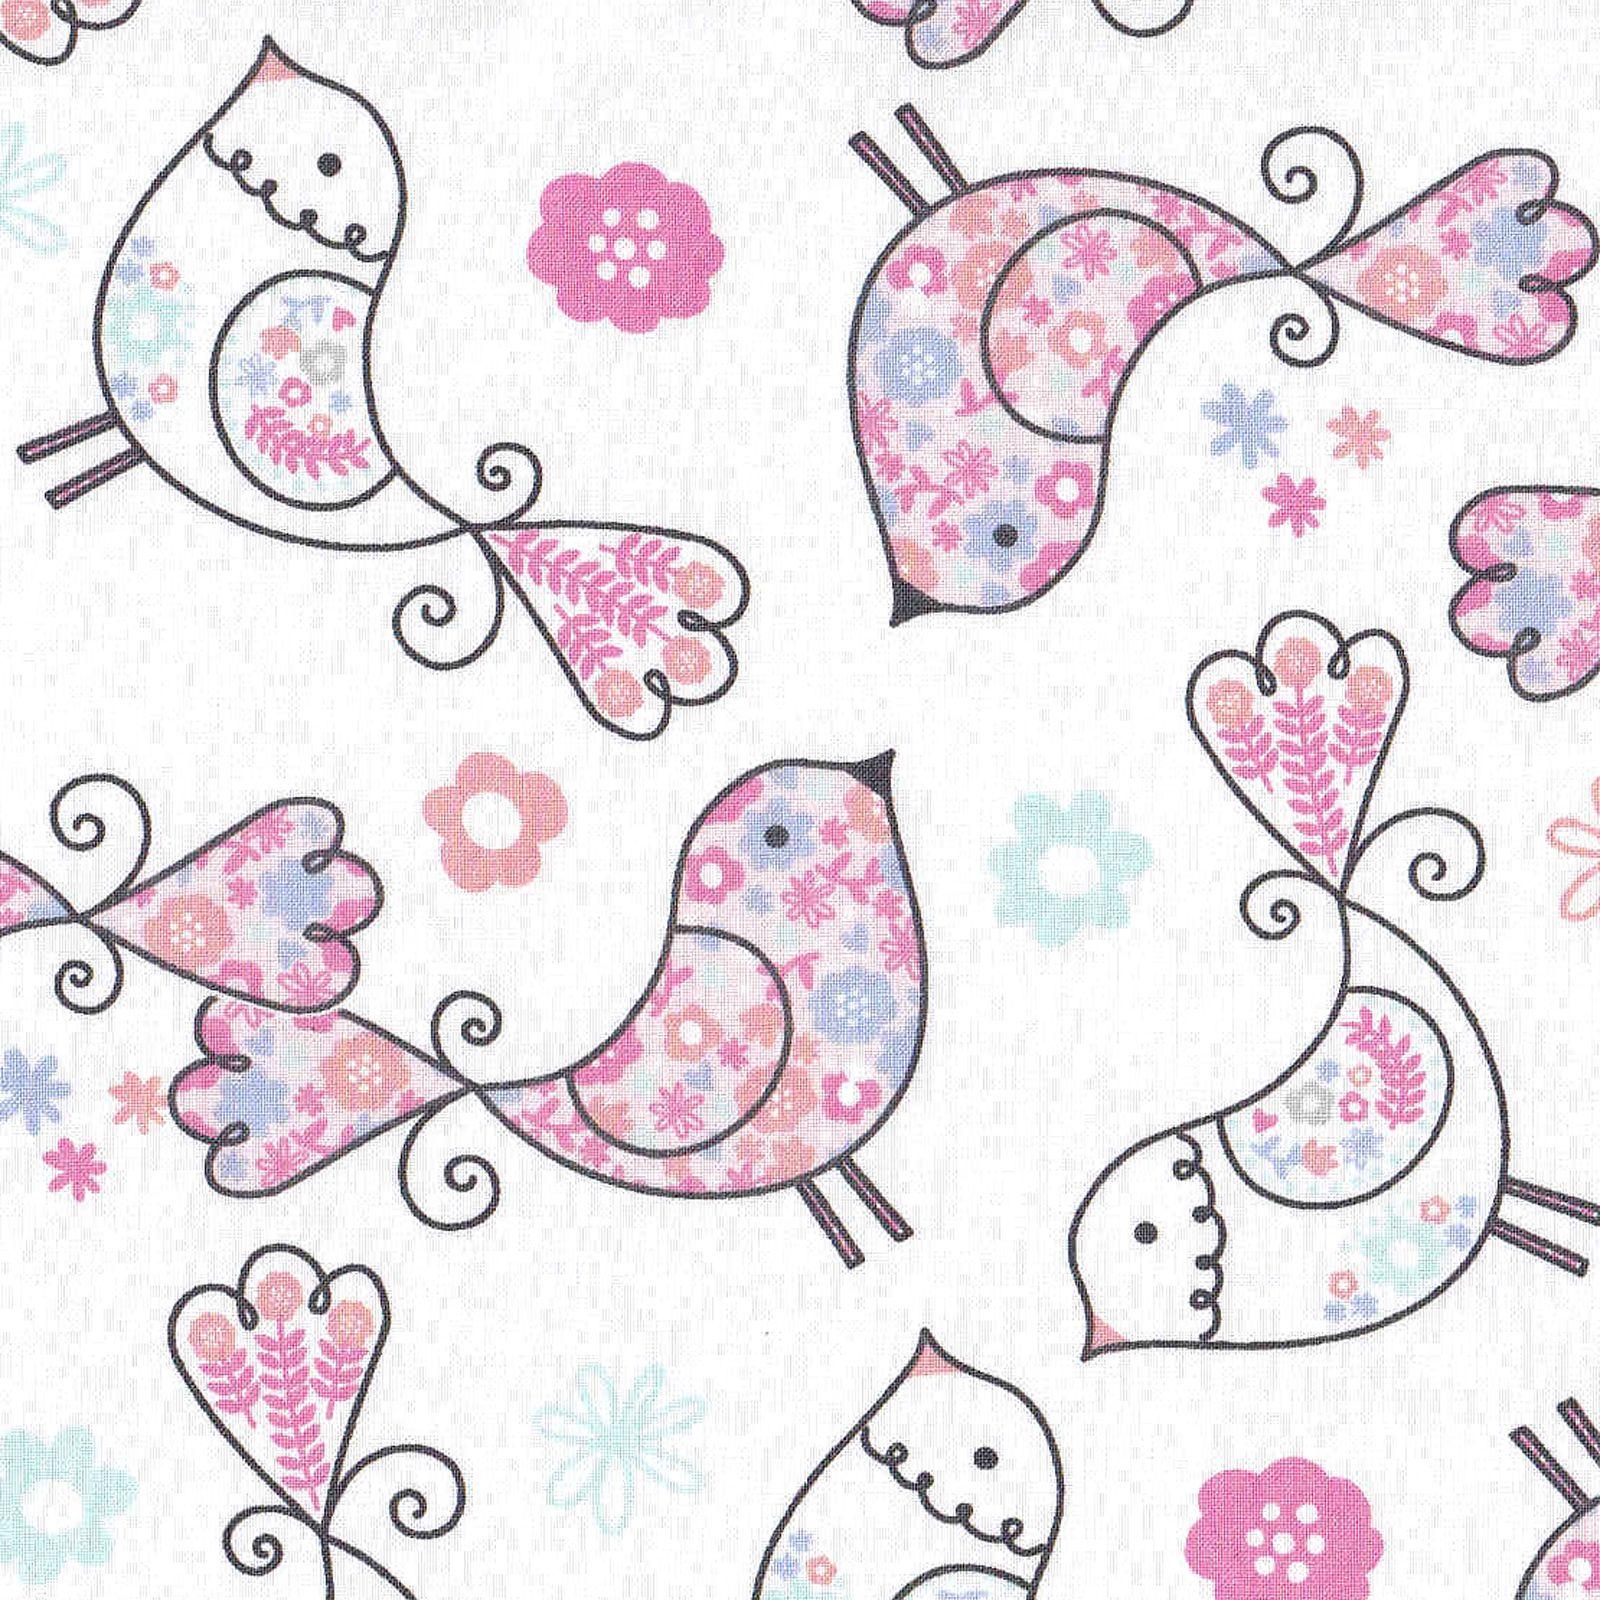 White apron joann fabrics - Nursery Fabric Flower Patch Birds White